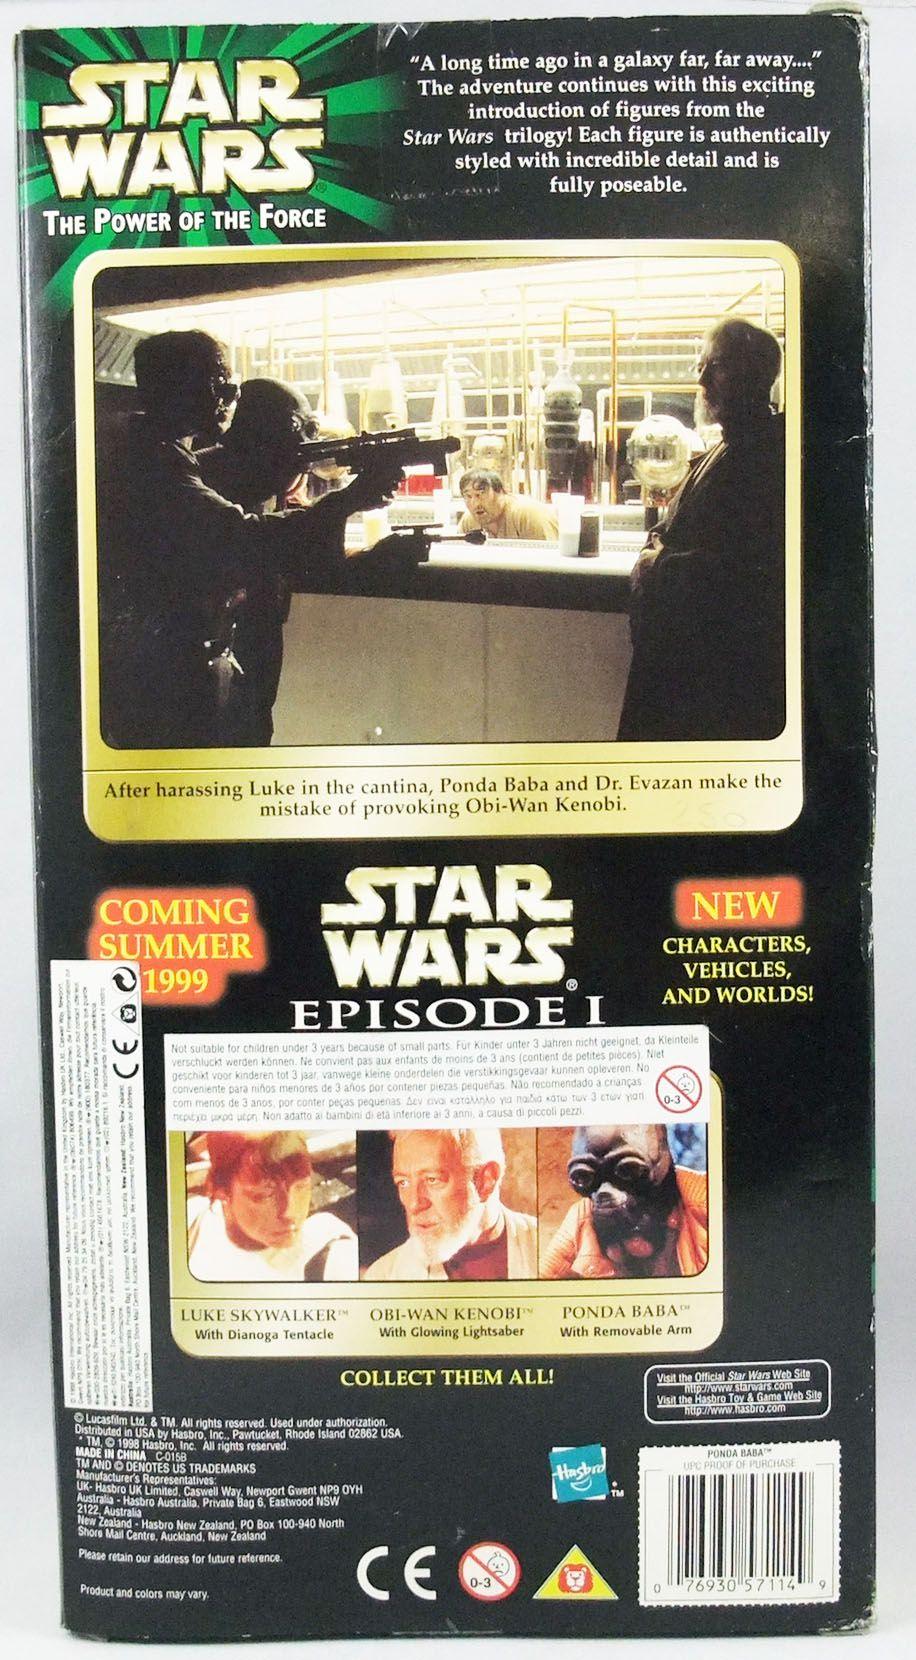 Star Wars Action Collection - Hasbro - Ponda Baba w/Removable  Arm